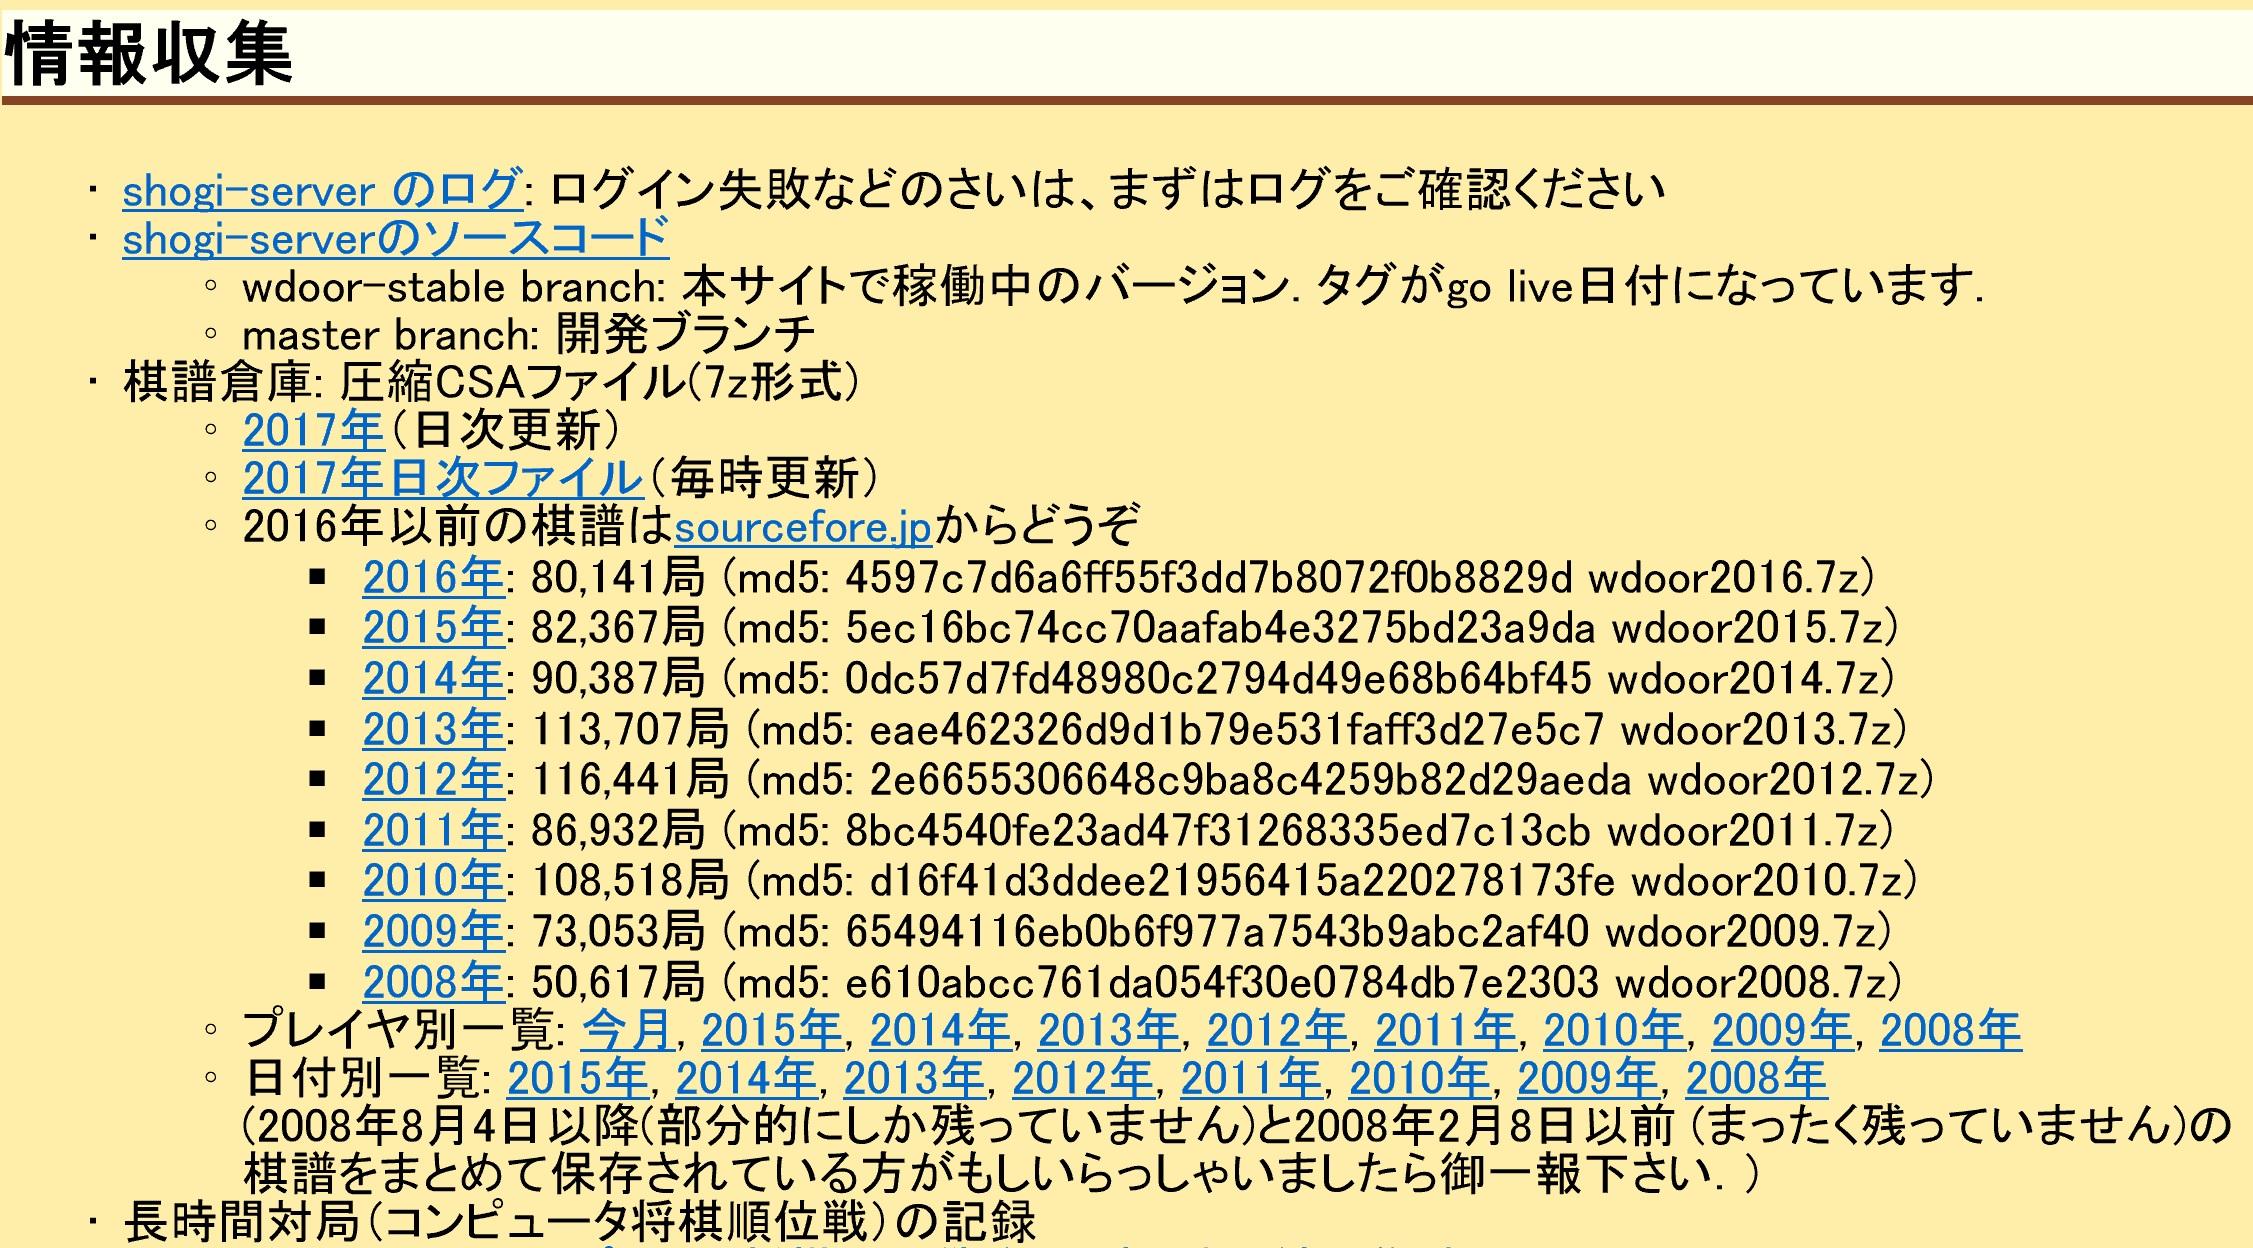 kifudownload.jpg